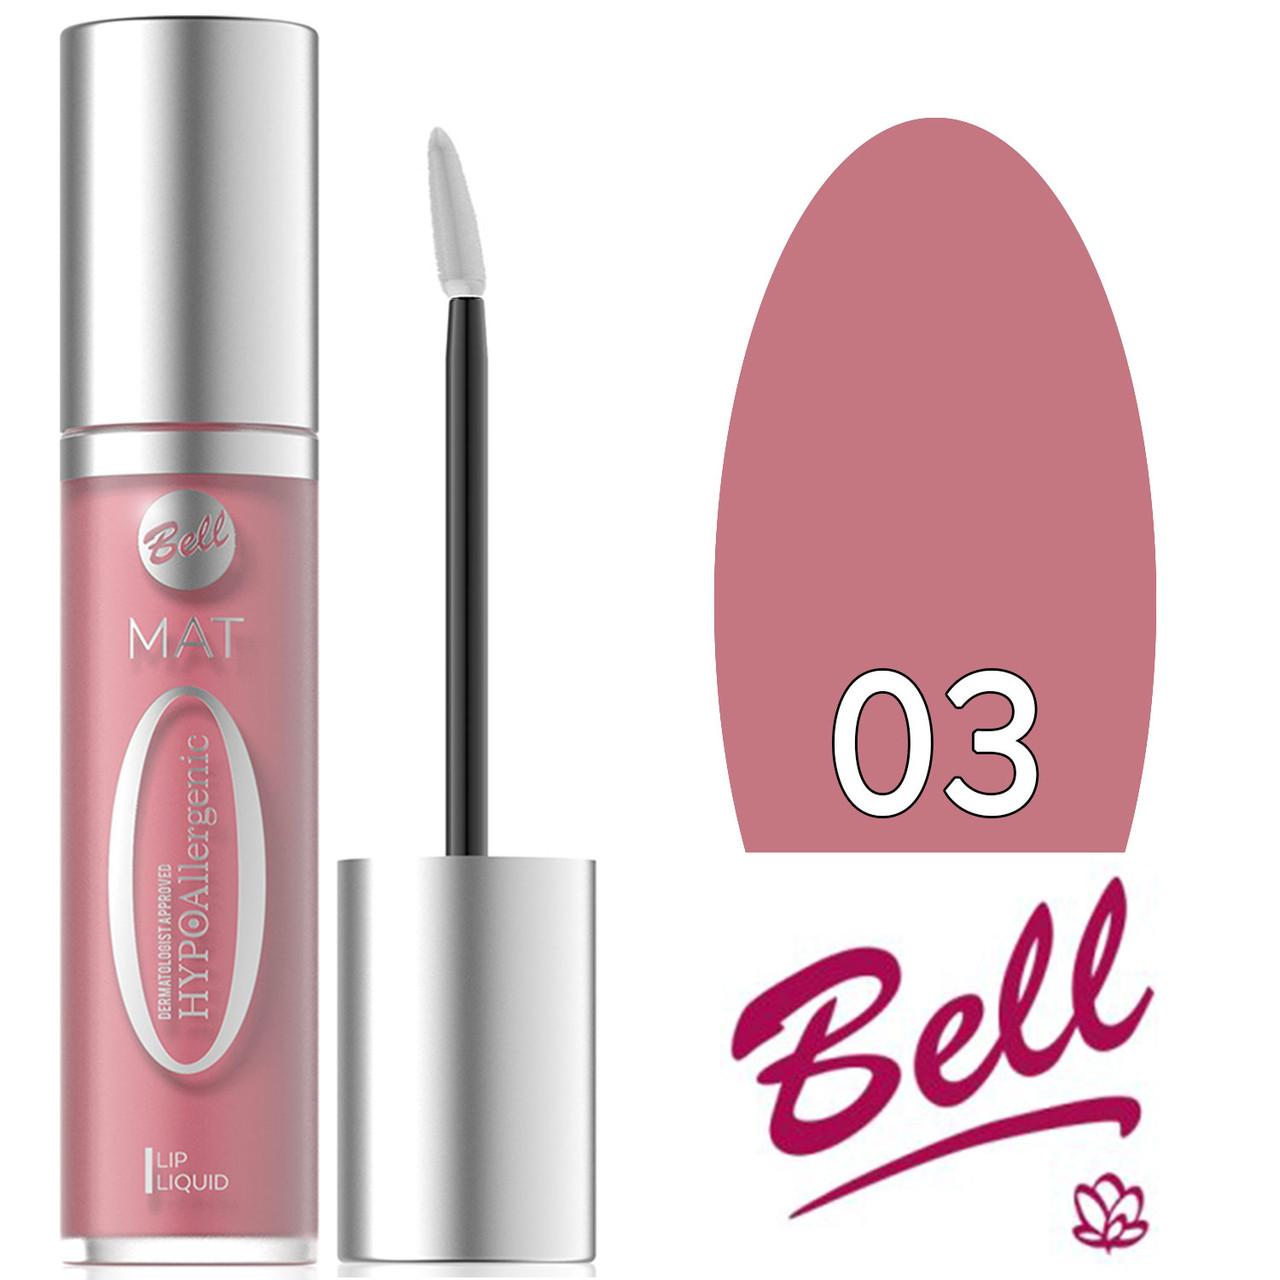 Bell HypoAllergenic - Жидкая губная помада Mat Lip Liquid Тон 03 pink rose матовая